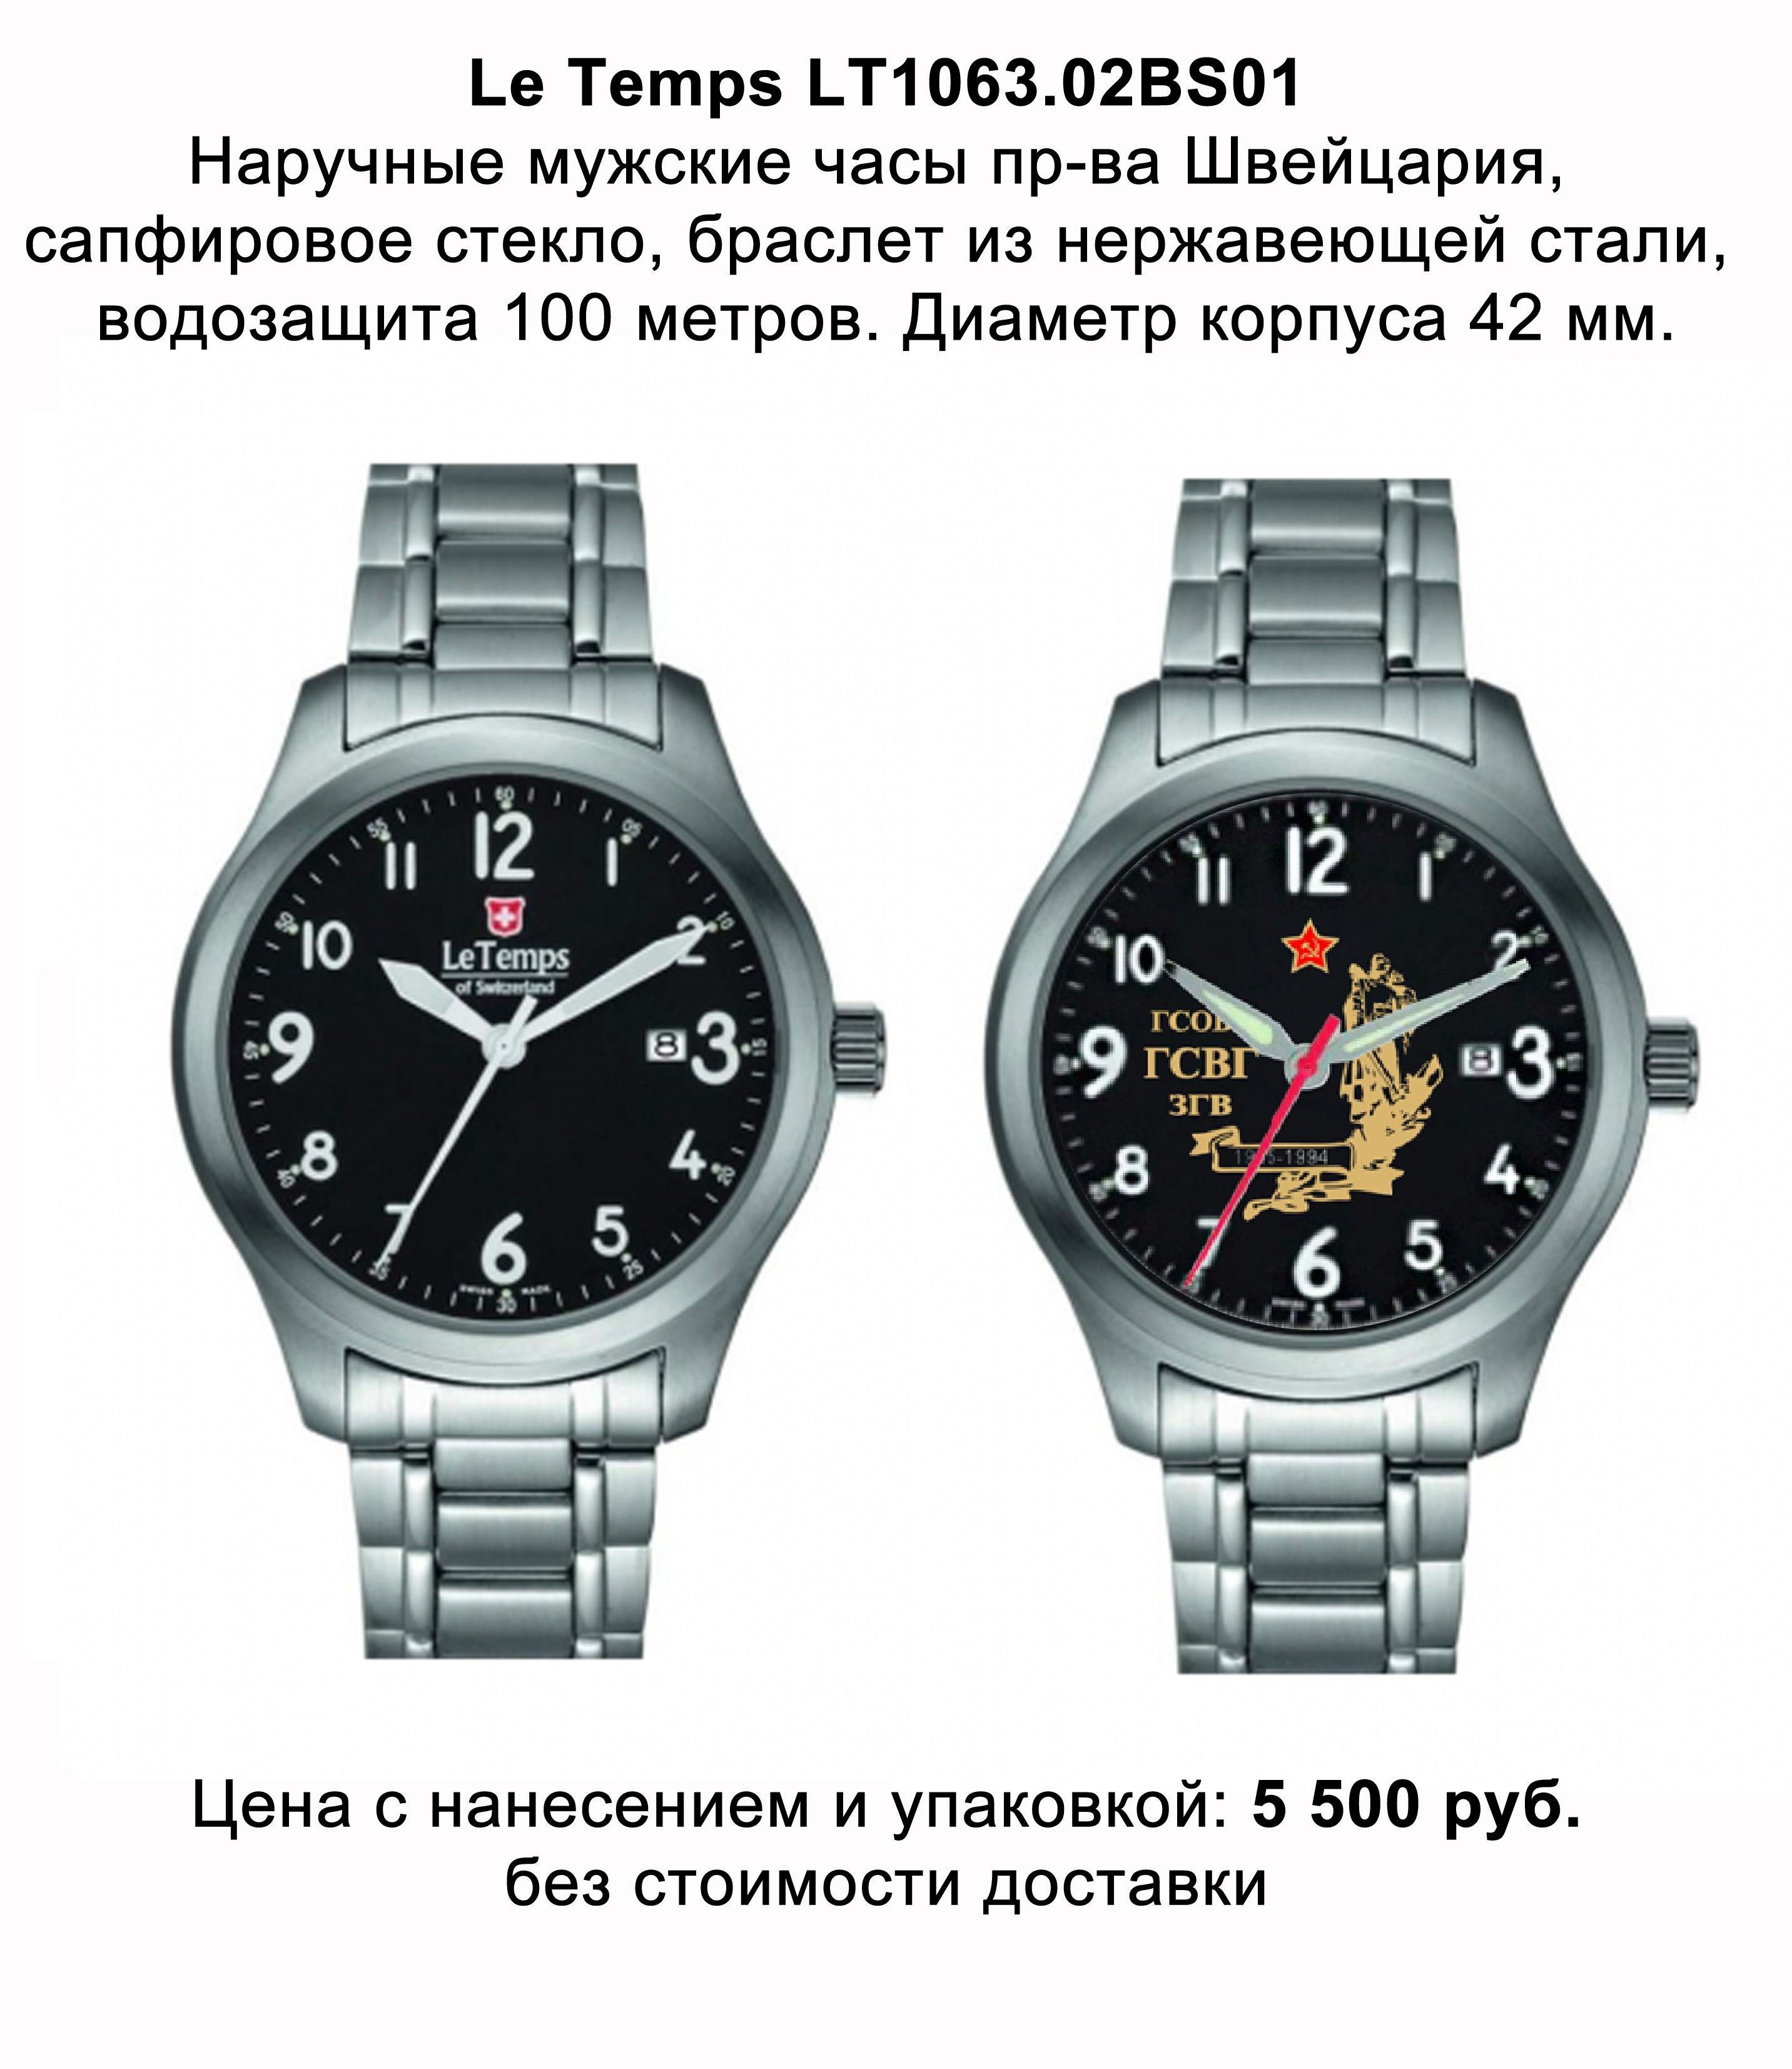 http://s3.uploads.ru/MhmFe.jpg